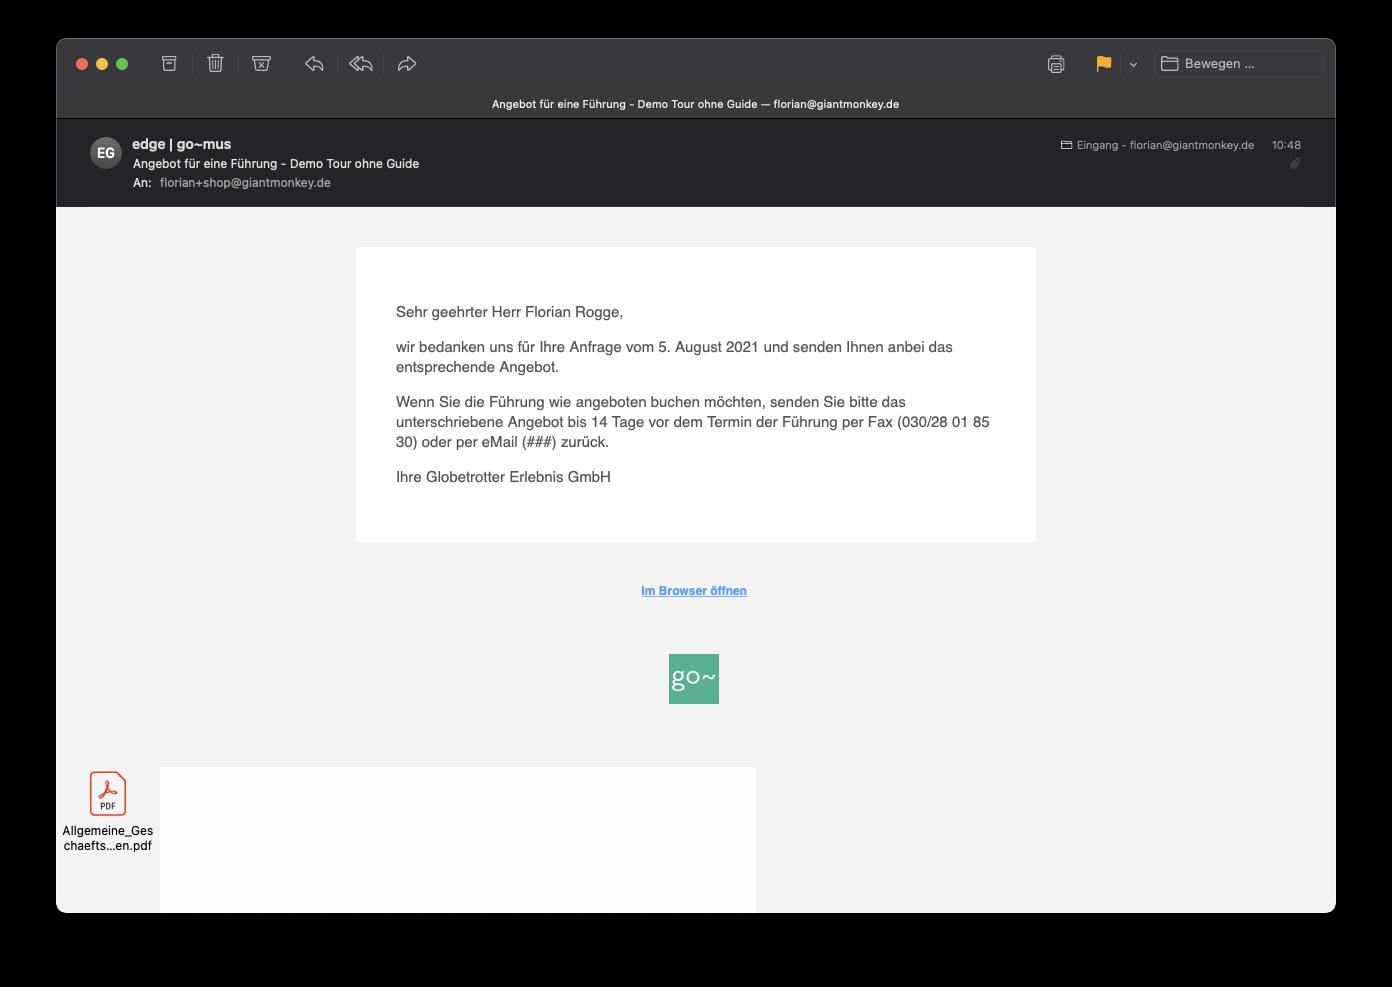 Screenshot der E-Mail für Buchungsangebot